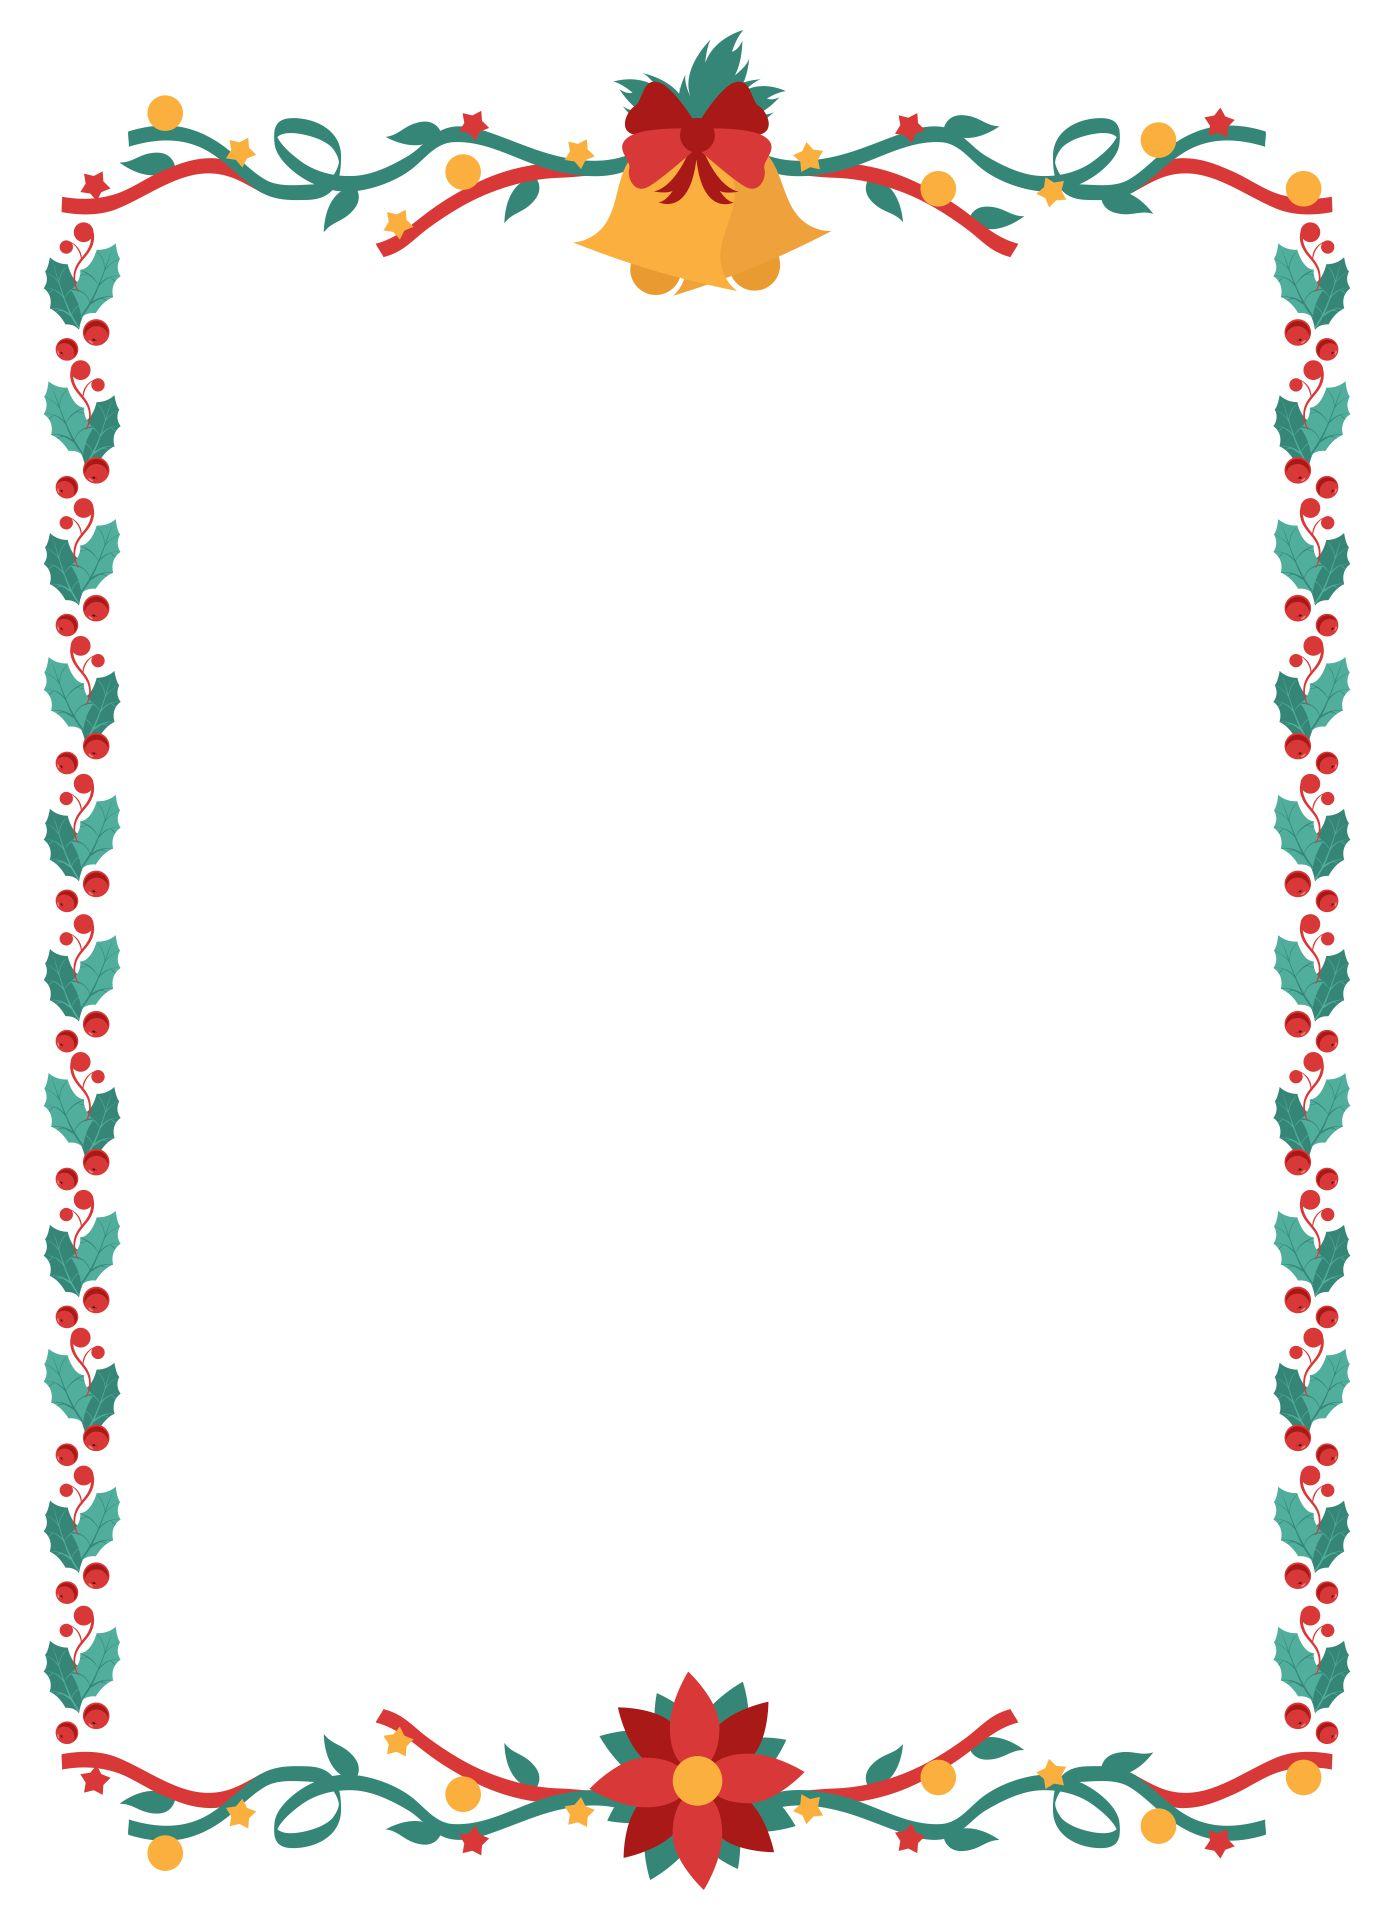 6 Images of Free Printable Christmas Stationary Borders